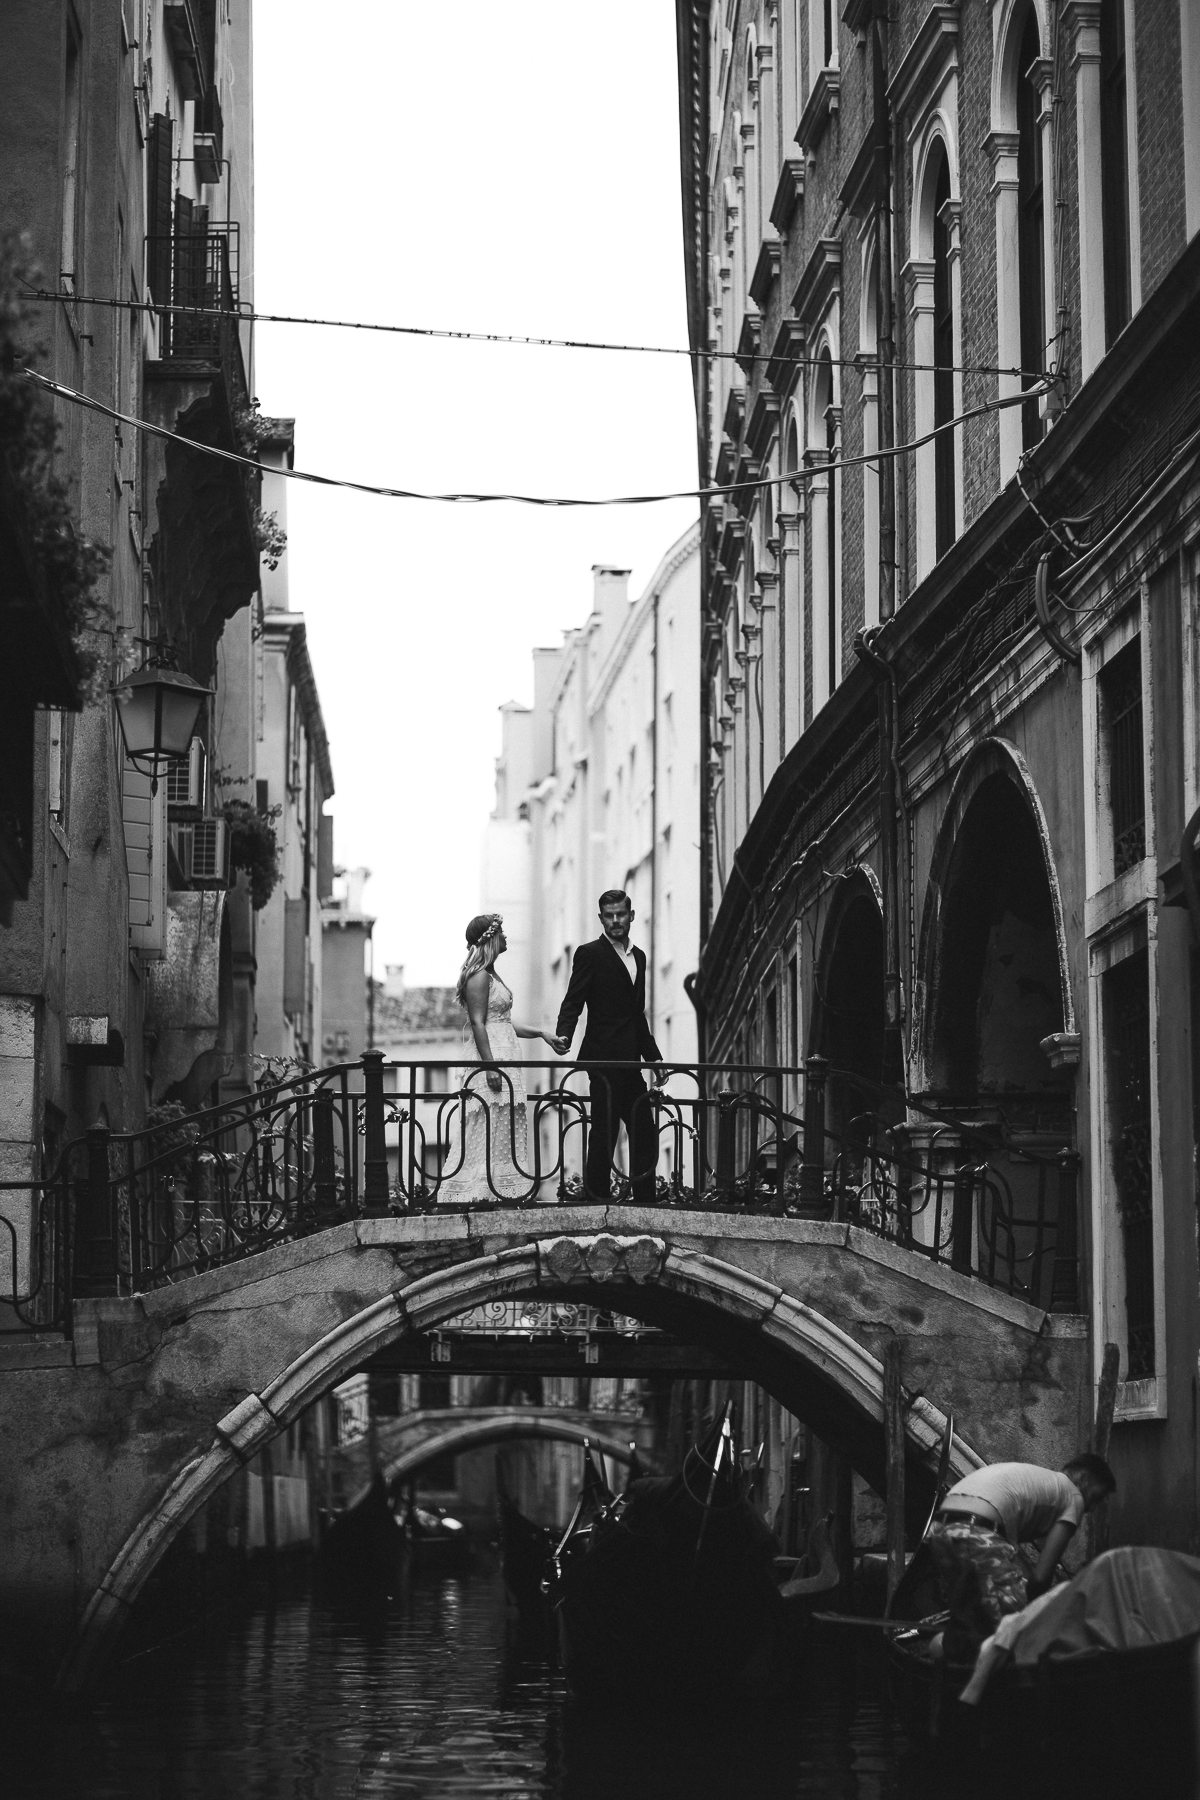 Hochzeitsfotograf Le Hai Linh Boho Chic After Wedding Shooting Venedig Timo Horn 1.FC Koeln 002.jpg